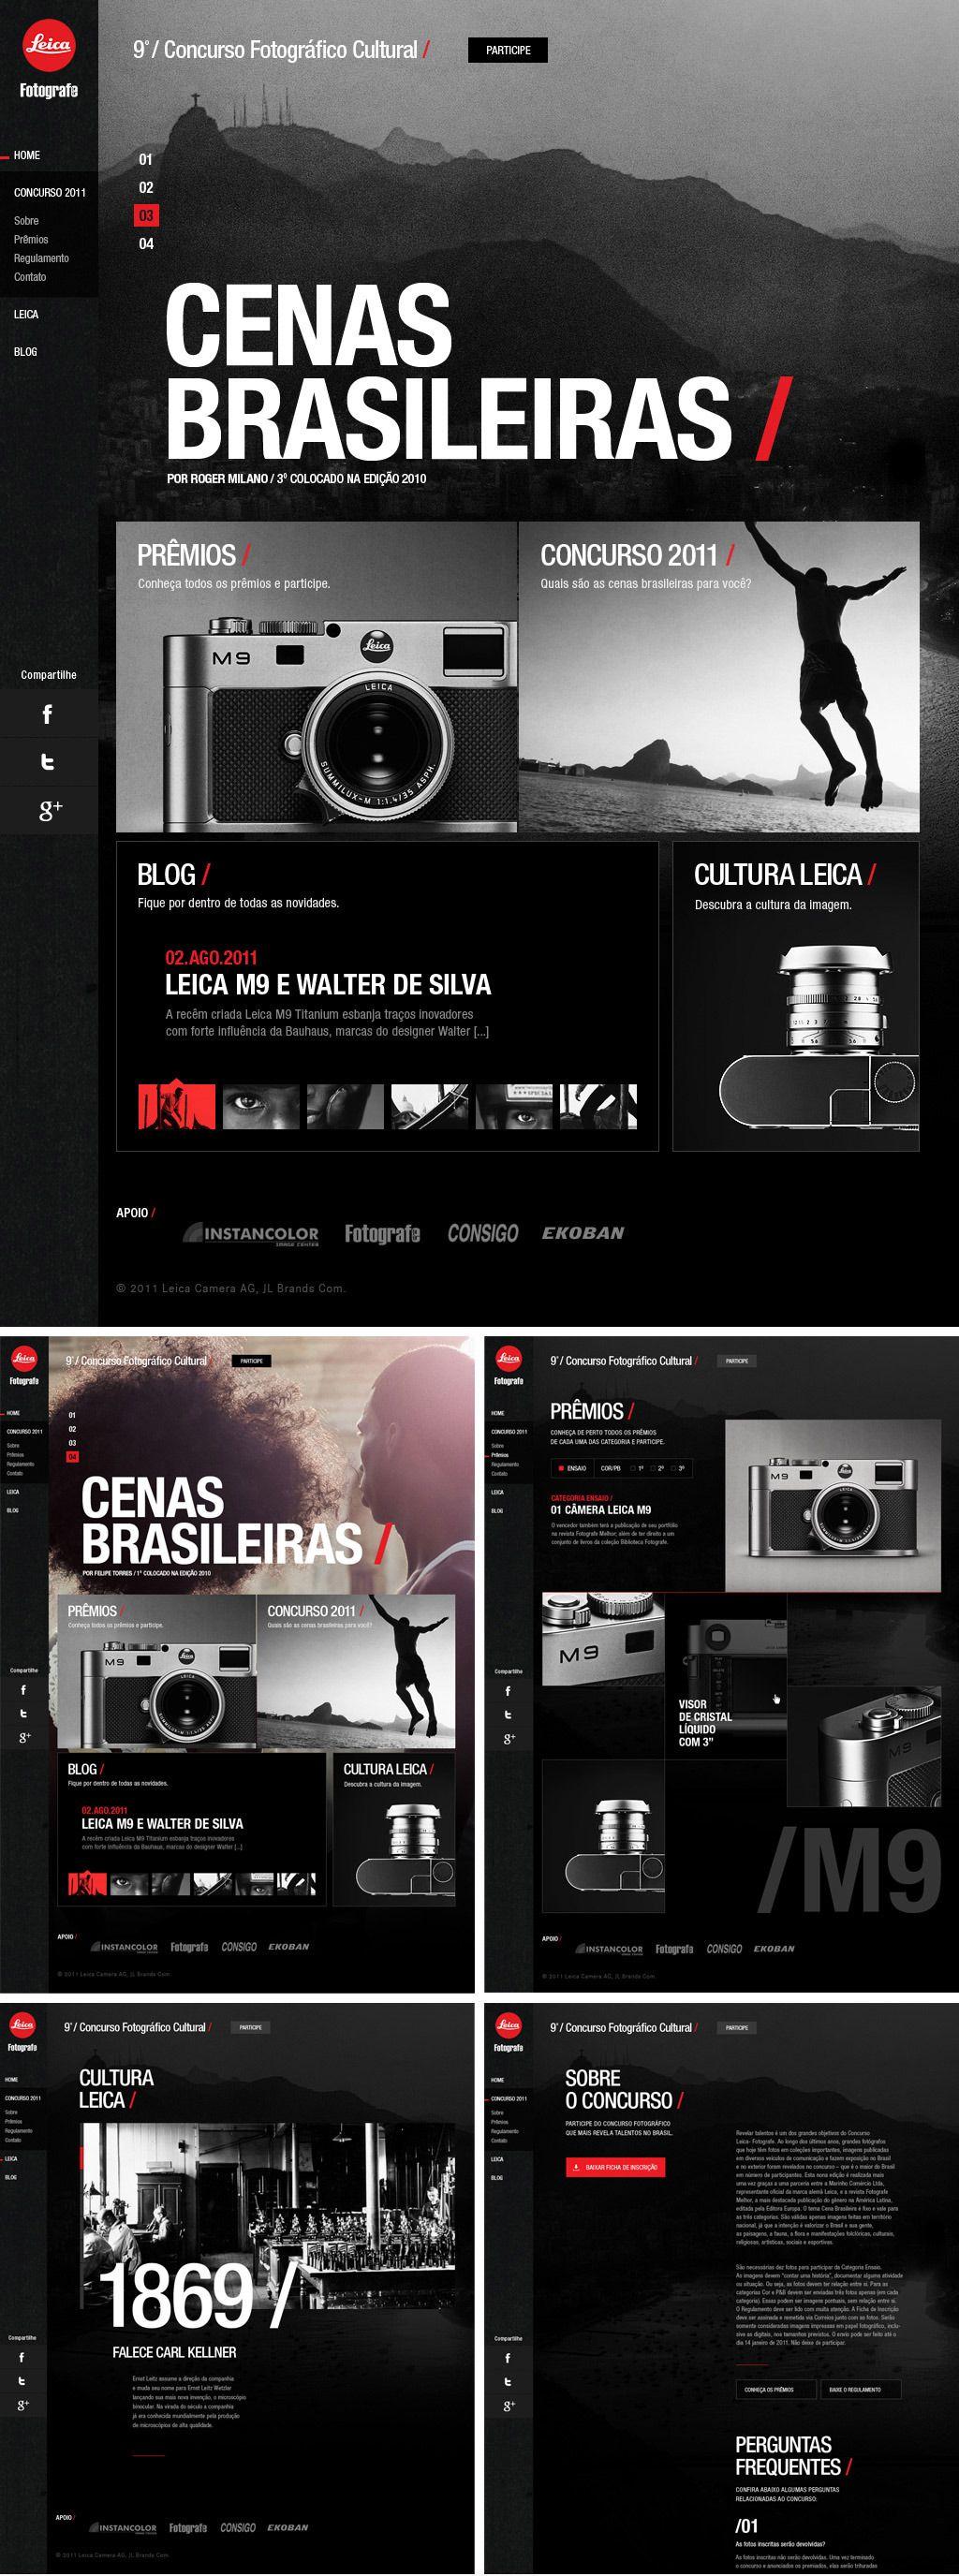 Leica / Augusto Paiva